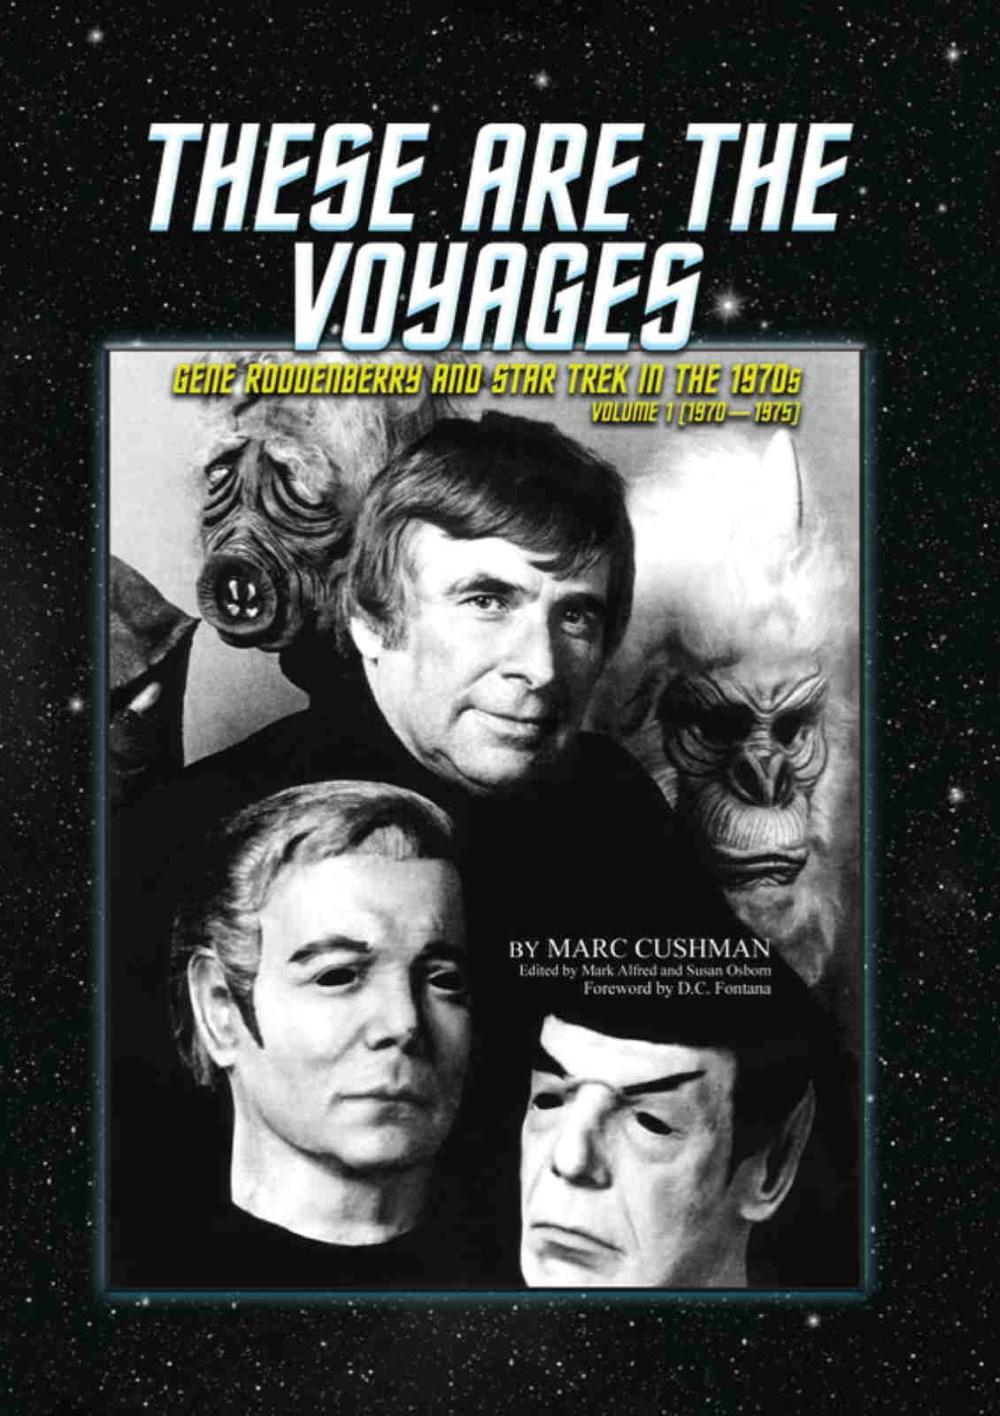 Cover of Cushman's book